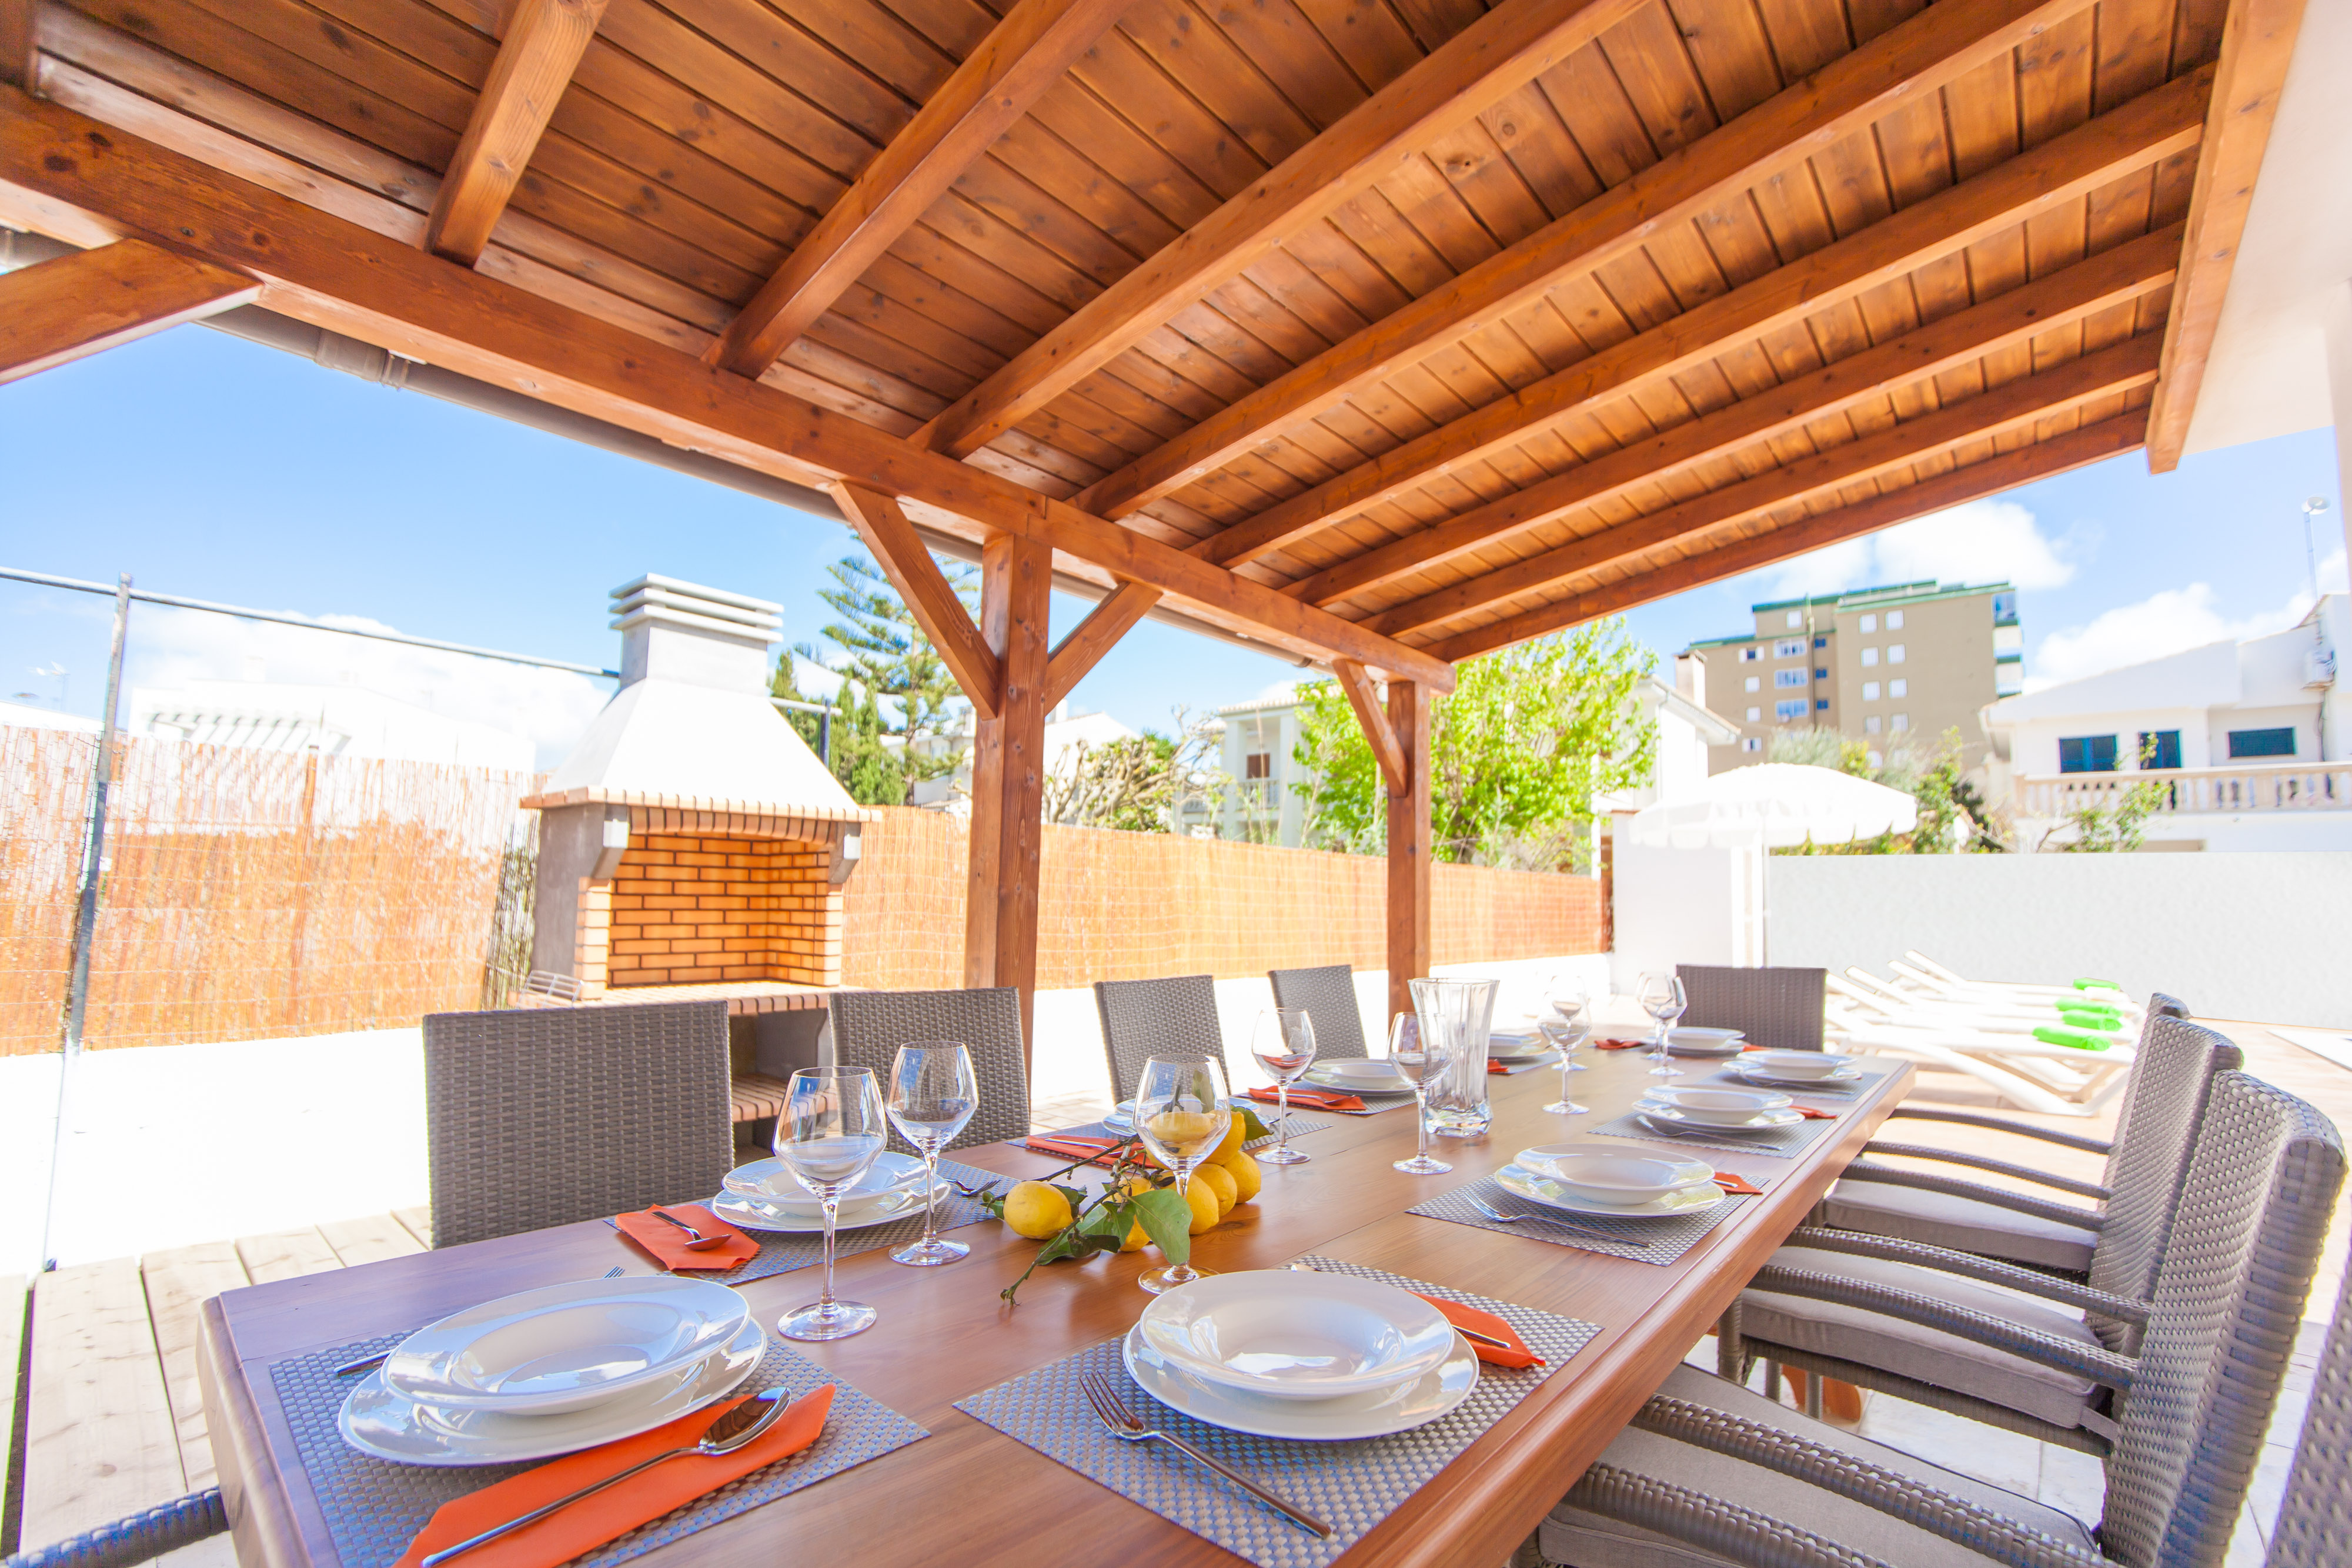 Ferienhaus RODRIGUEZ DE LA FUENTE 19 (SIN NOMBRE) (2144936), Platja de Muro, Mallorca, Balearische Inseln, Spanien, Bild 5